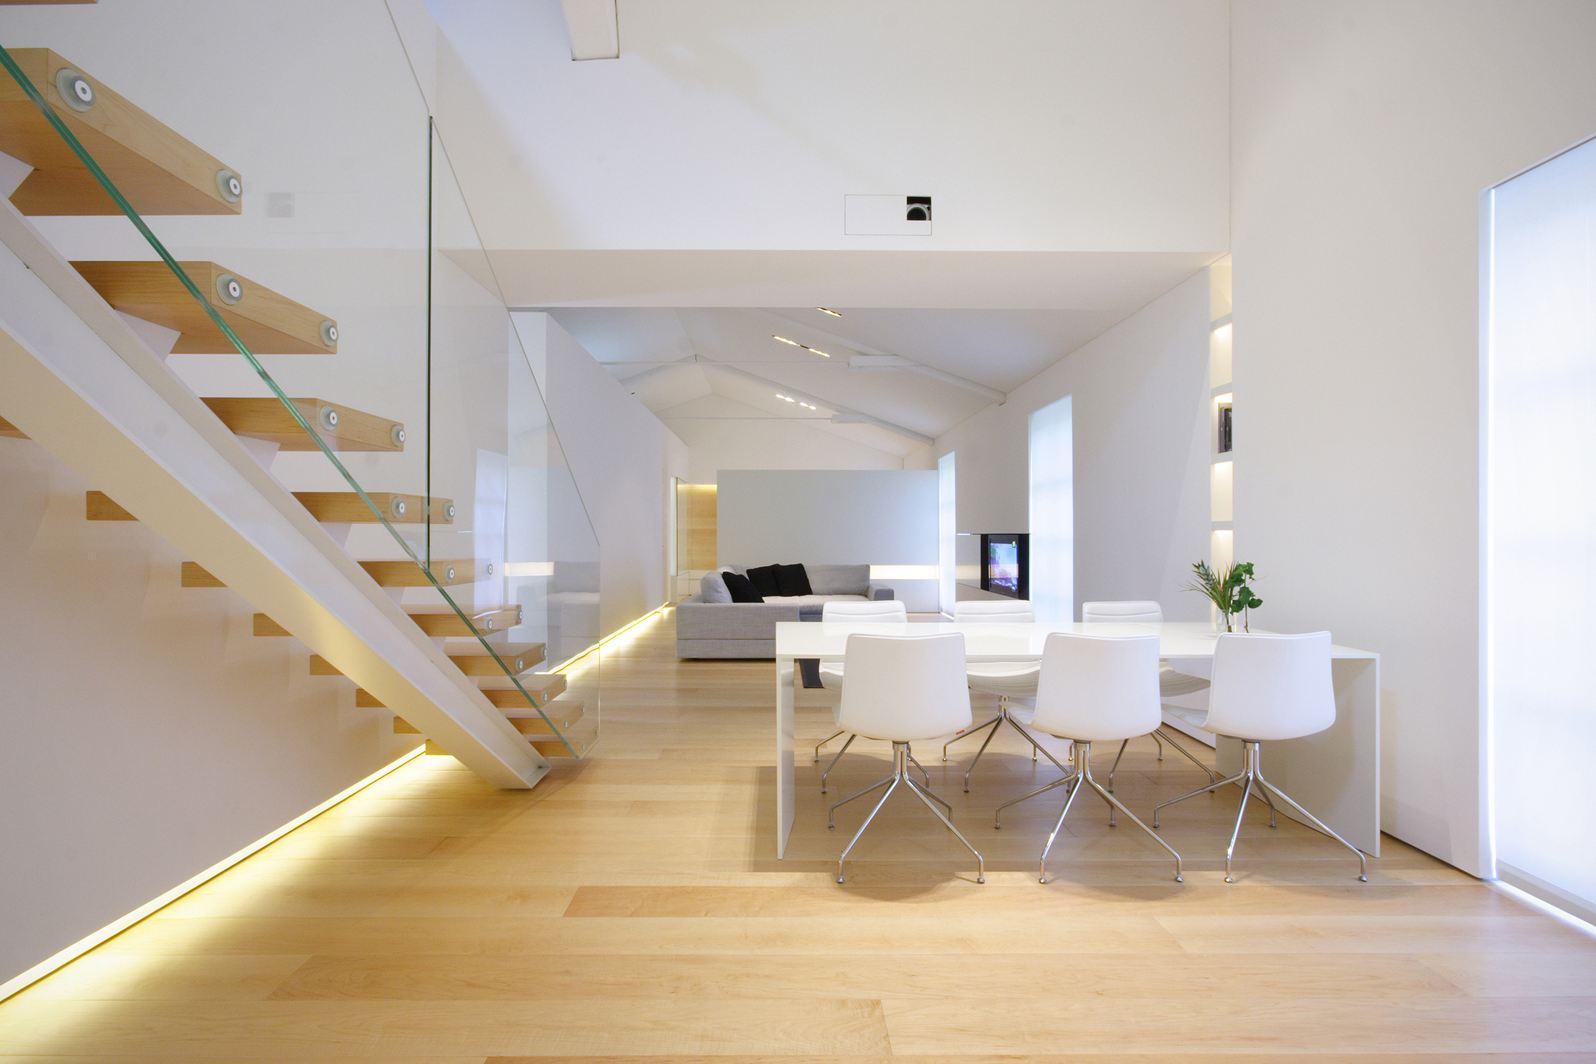 Un loft minimalista a Como - Mansarda.it